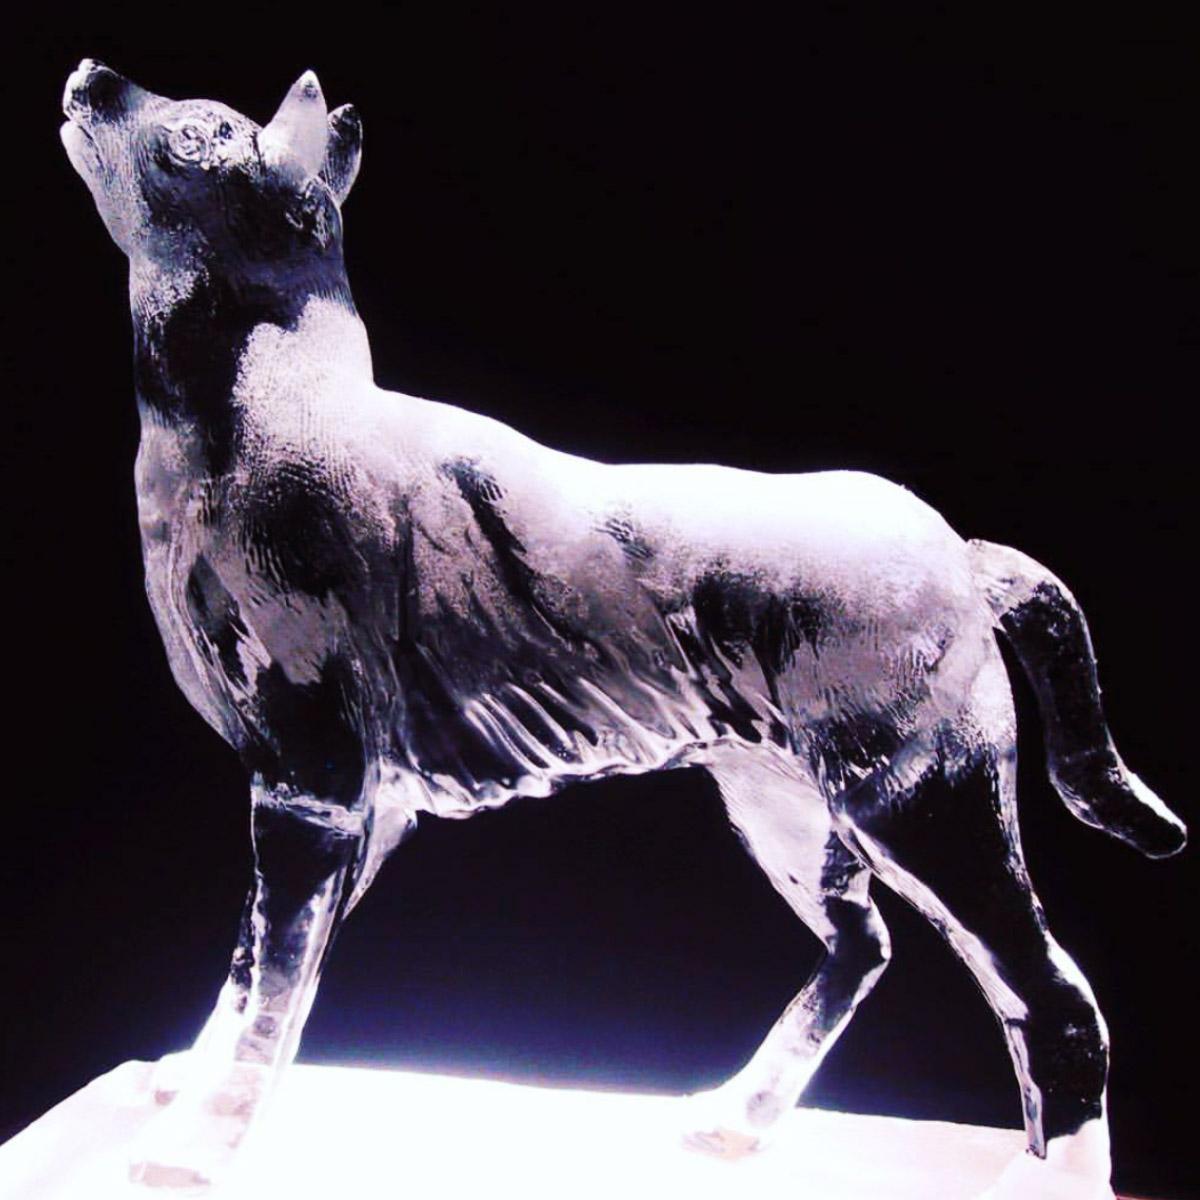 "<strong>sculptures</strong><a href=""/portfolio-celebrations-sculptures"">view »<a>"